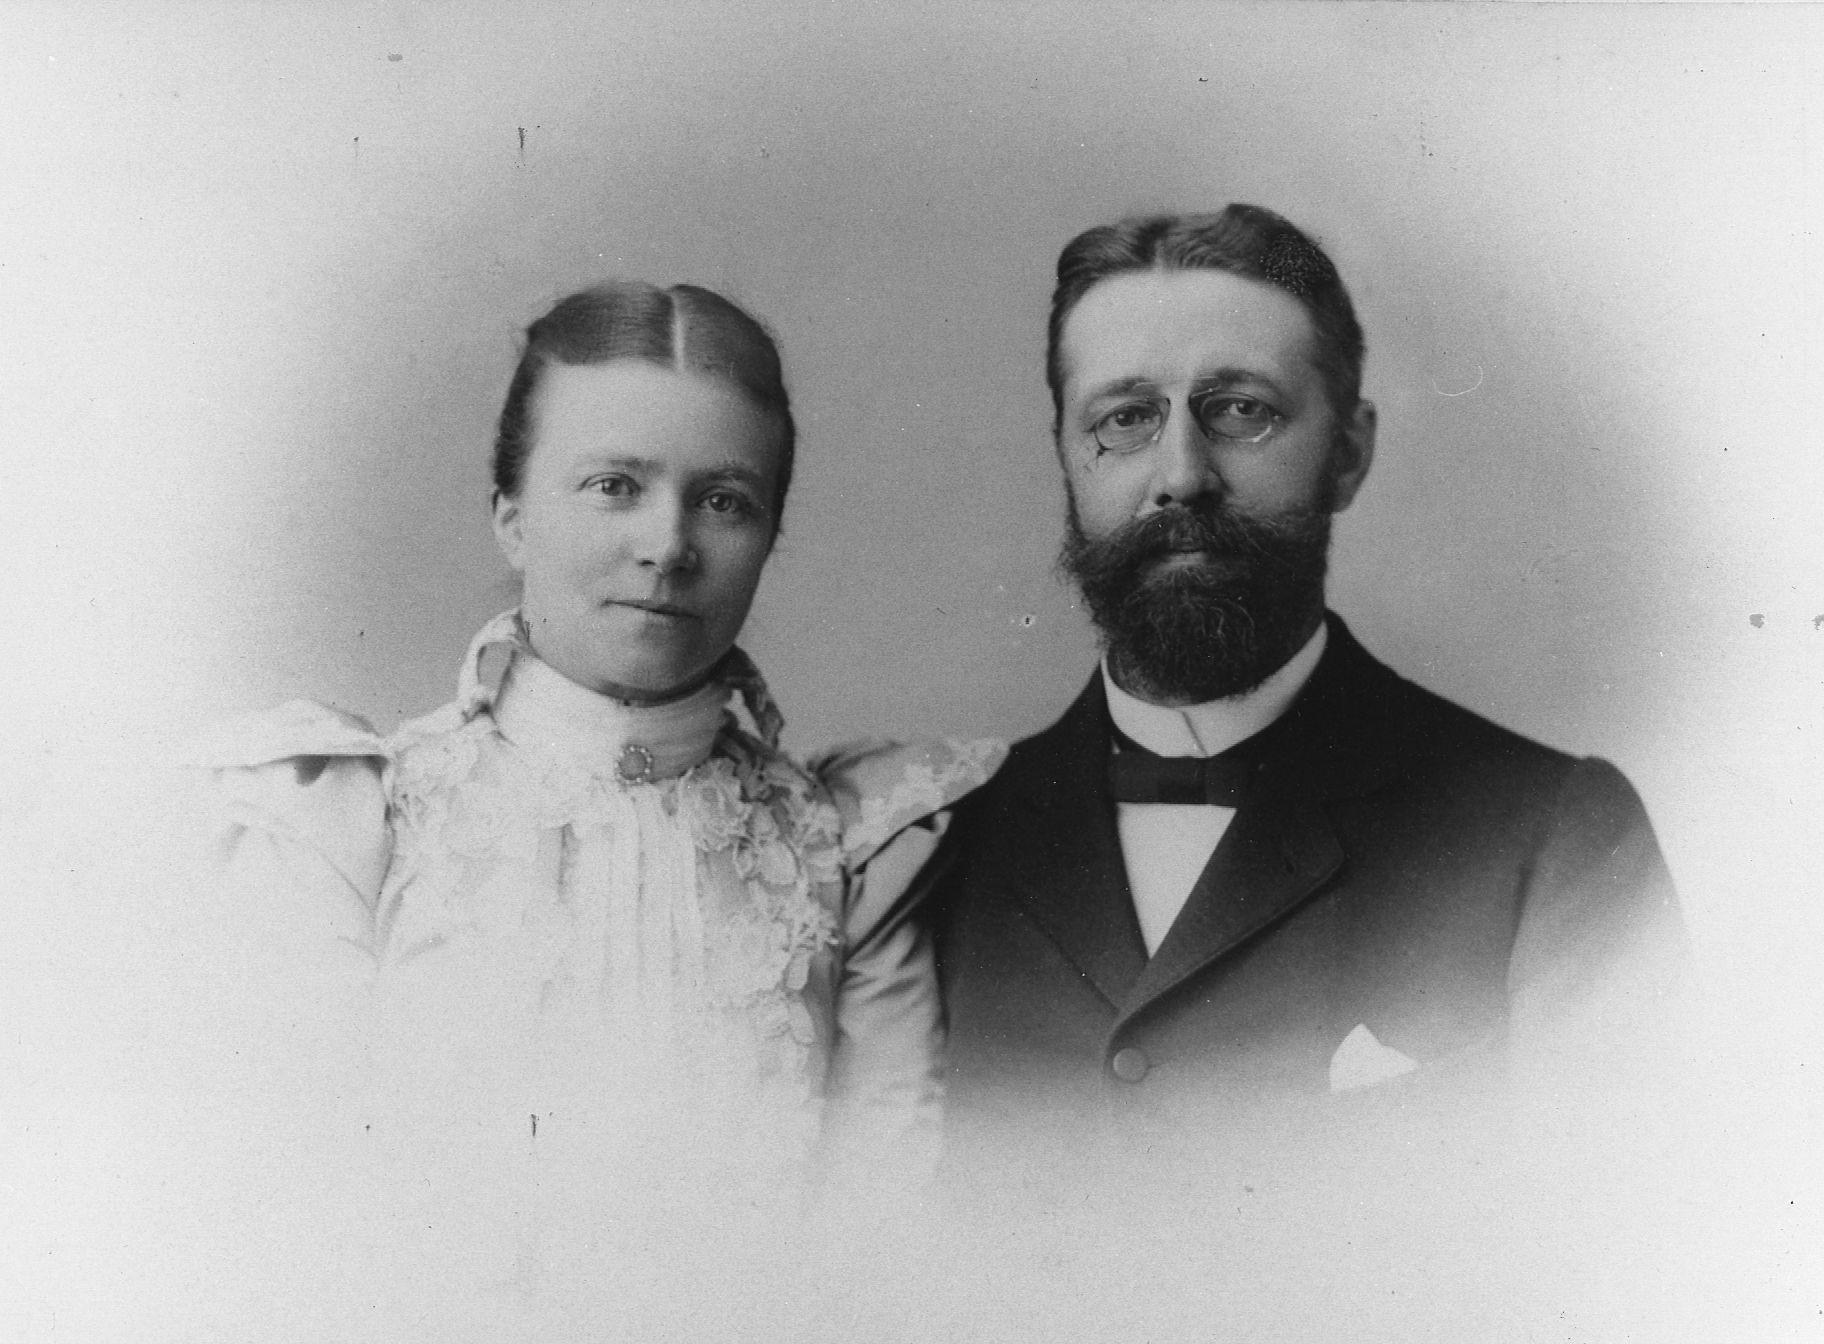 Max Carl Wilhelm Weber